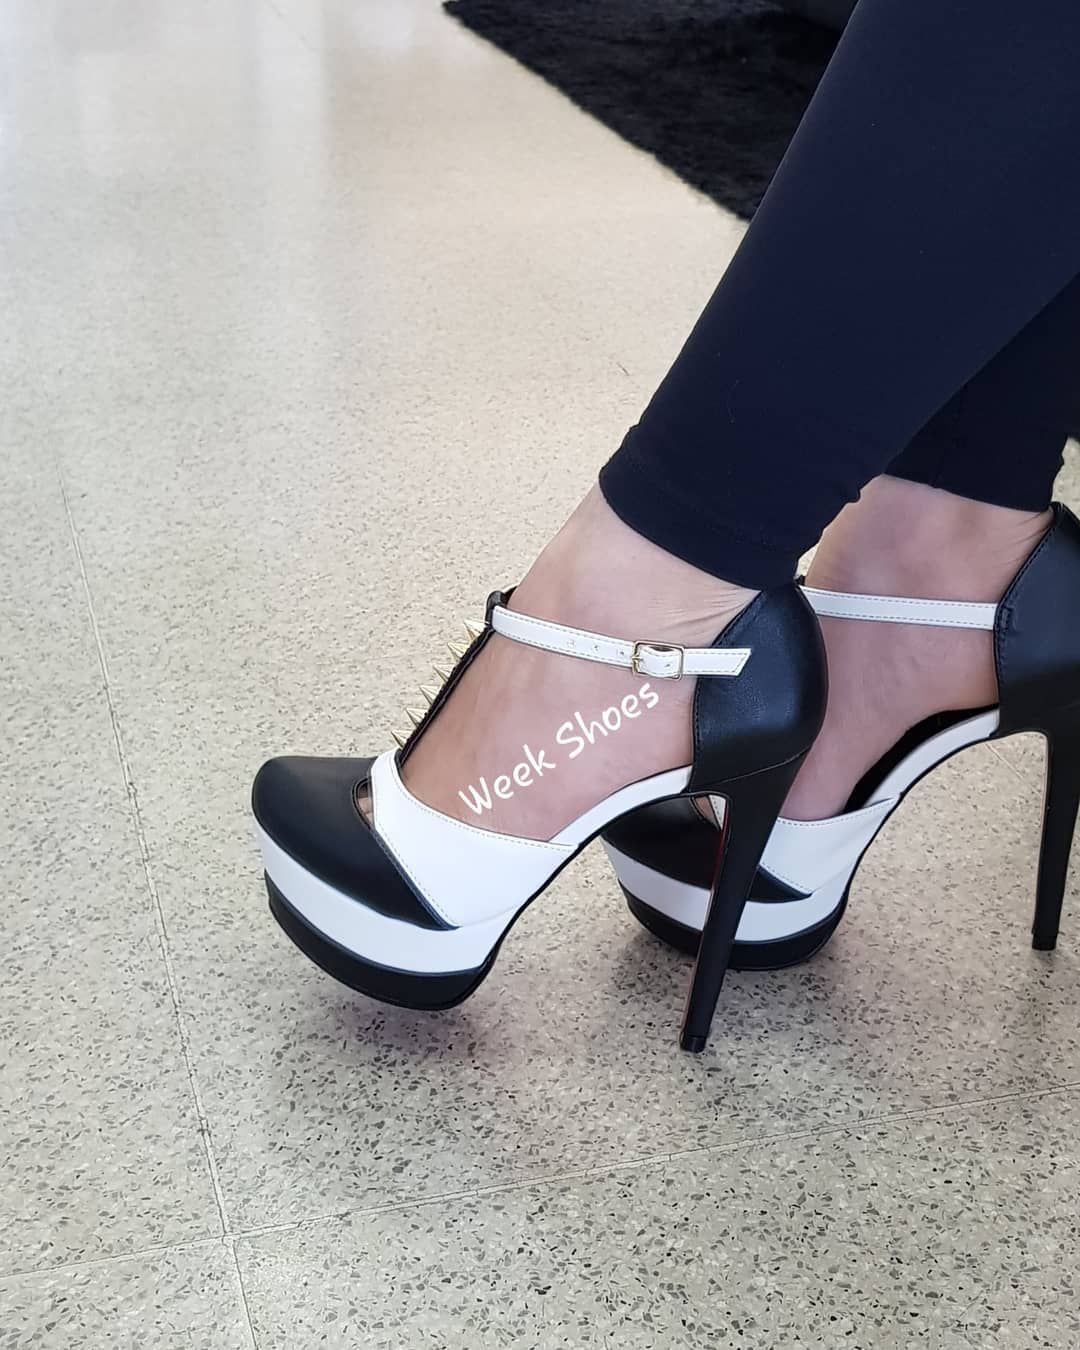 Scarpin Salto Grosso Preto – Week Shoes: Conforto e estilo